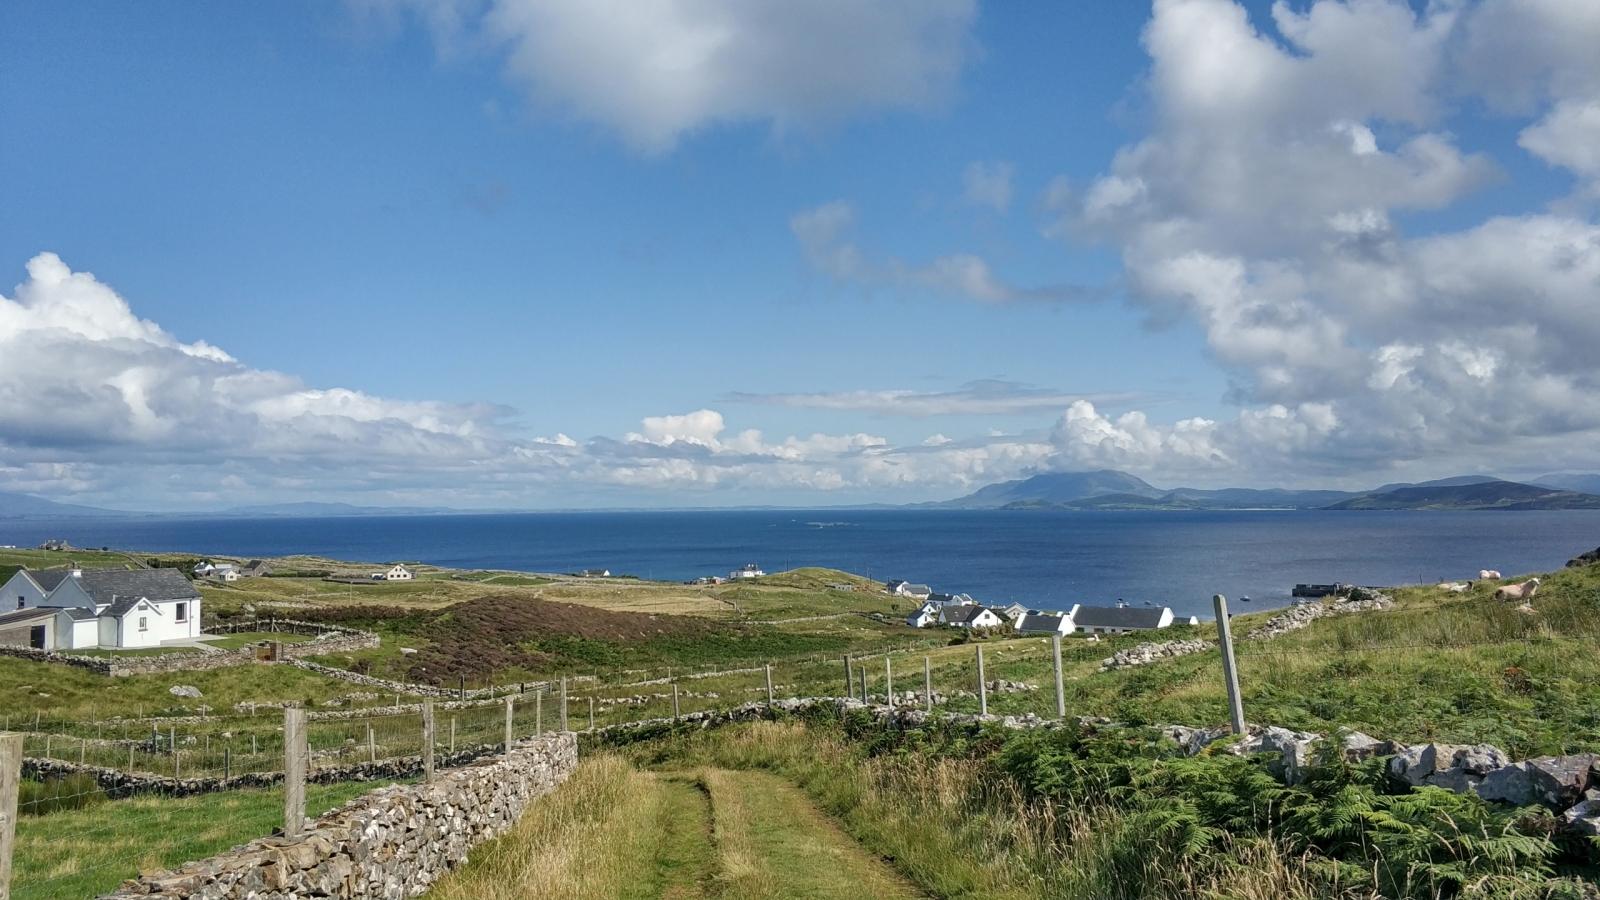 Ирландия как IT-эмигранту поменять работу